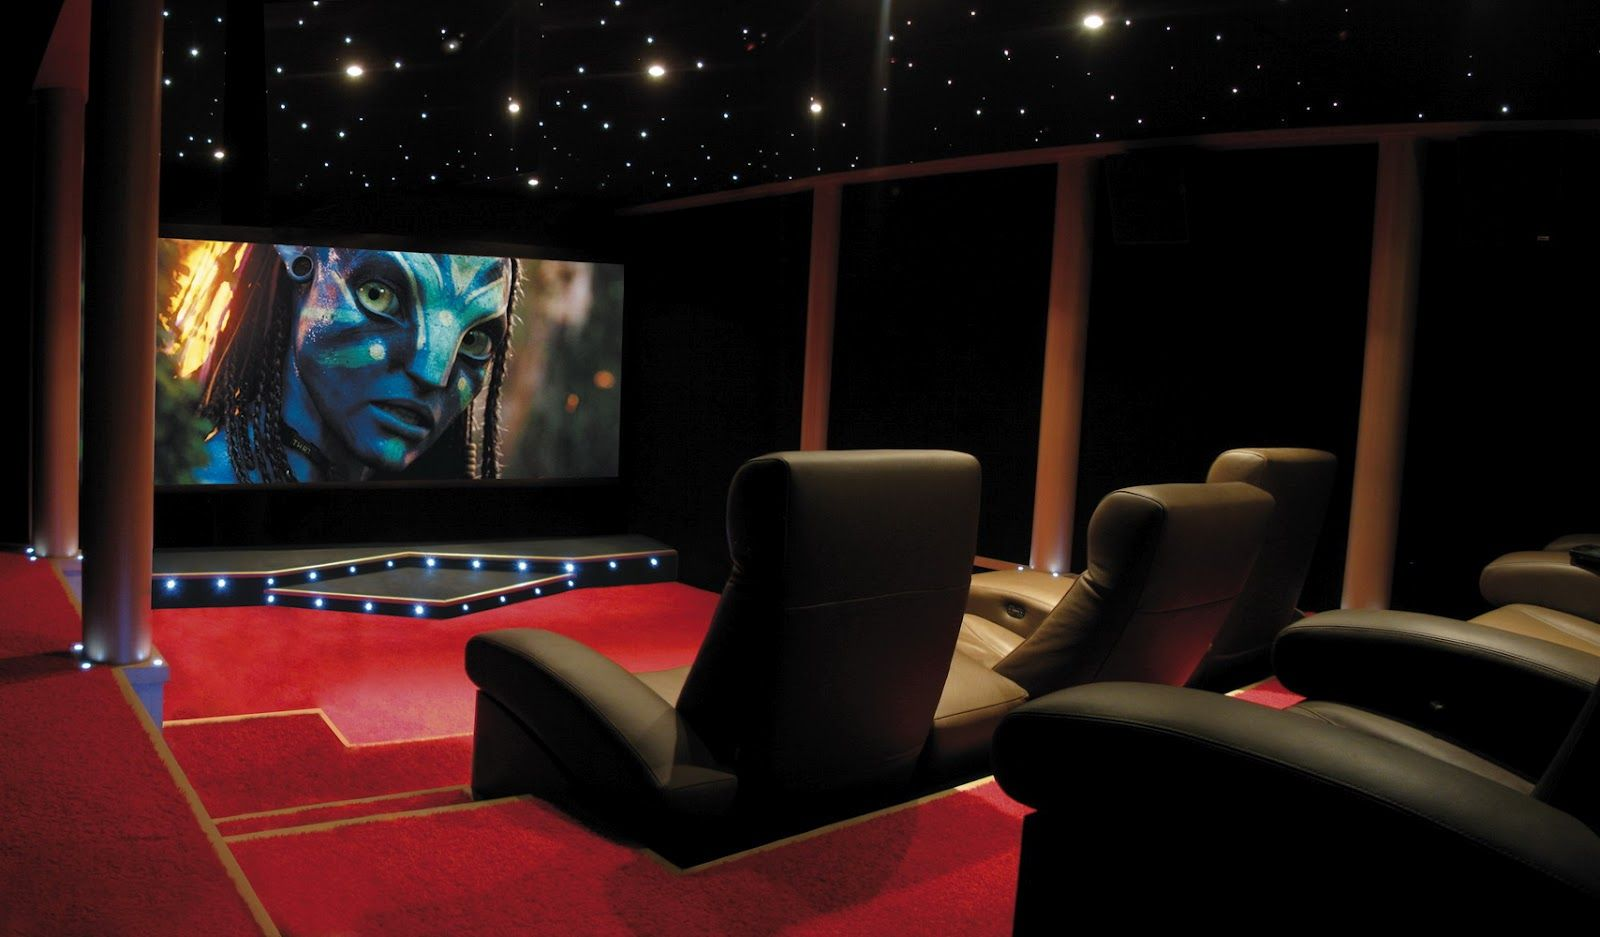 Salle De Home Cinema Salle Home Cinema 7 2 Emotions